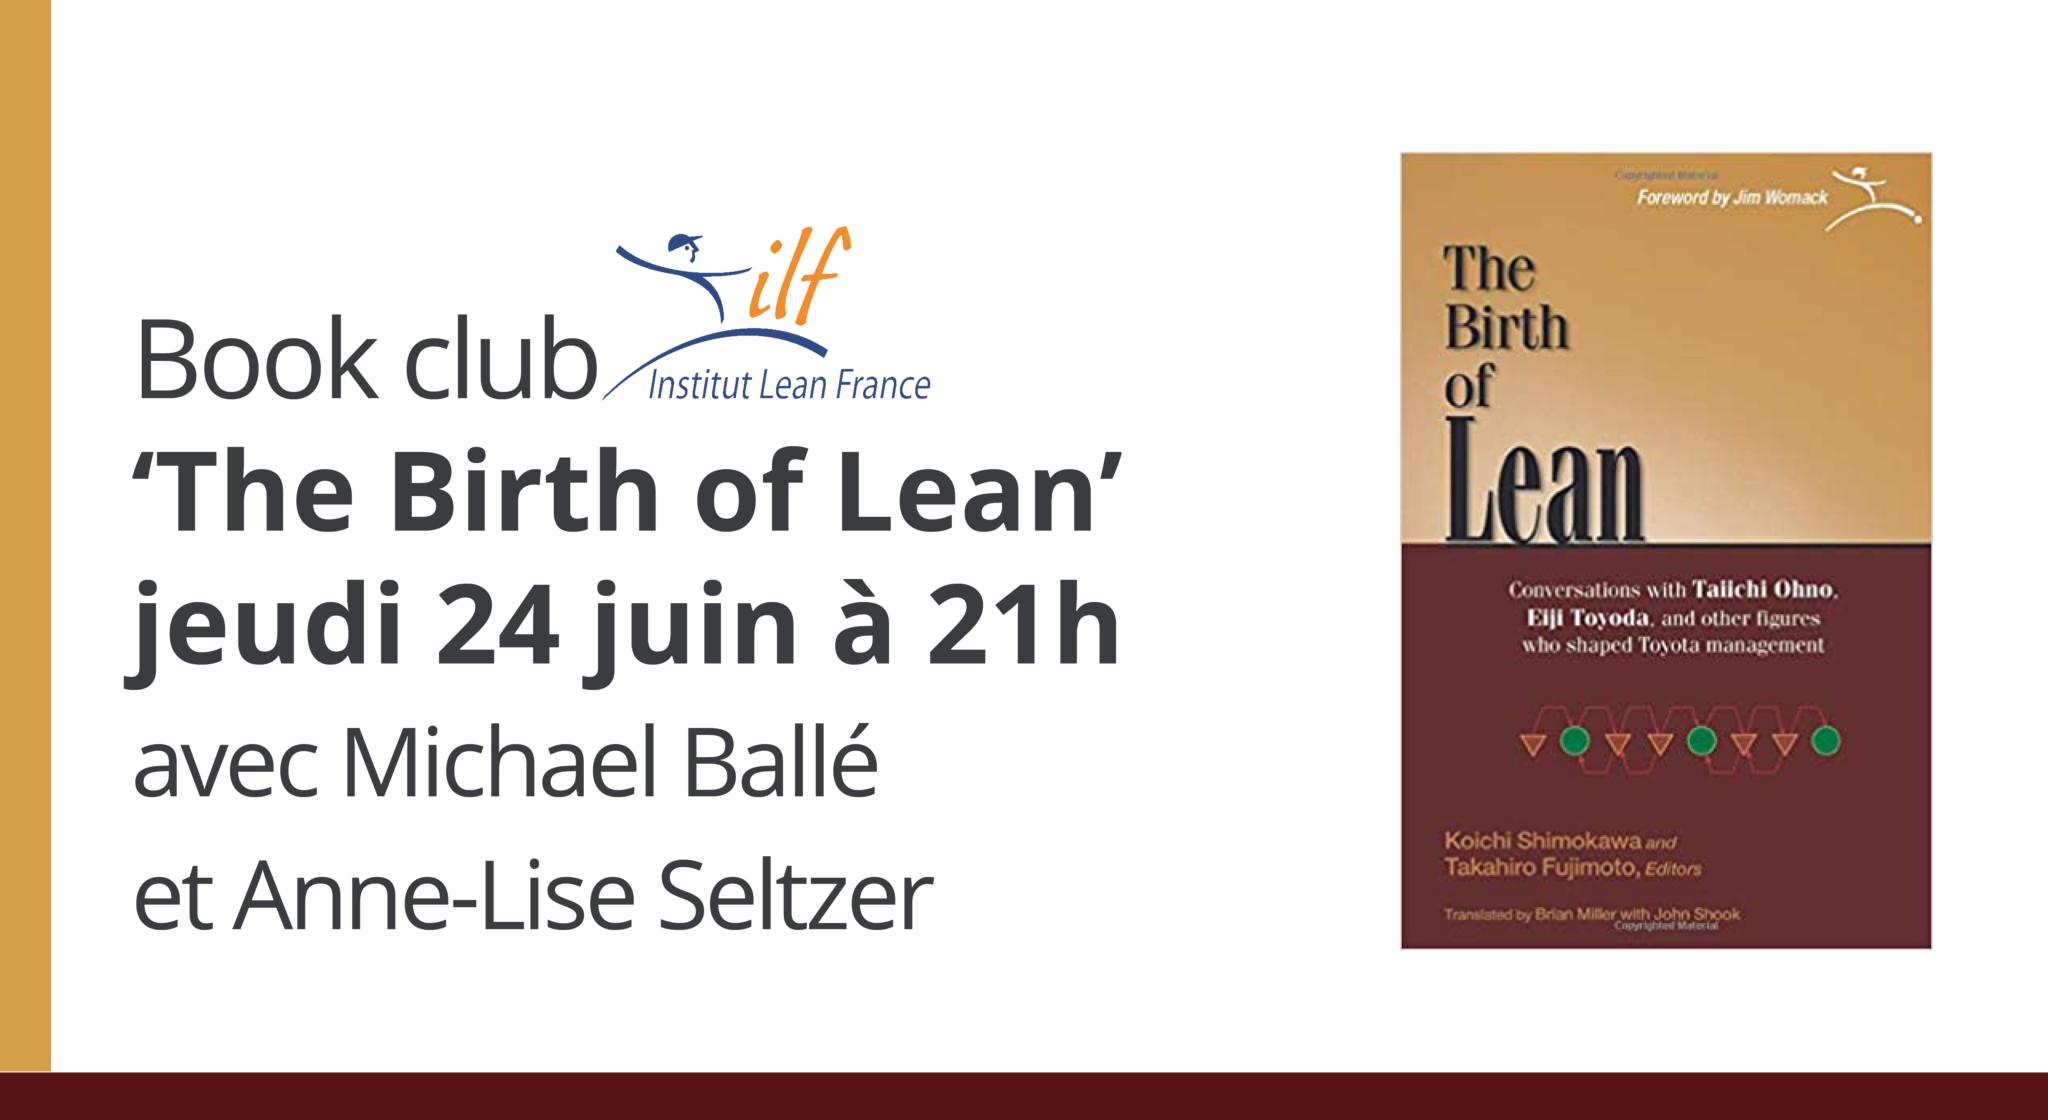 book club the birth of lean